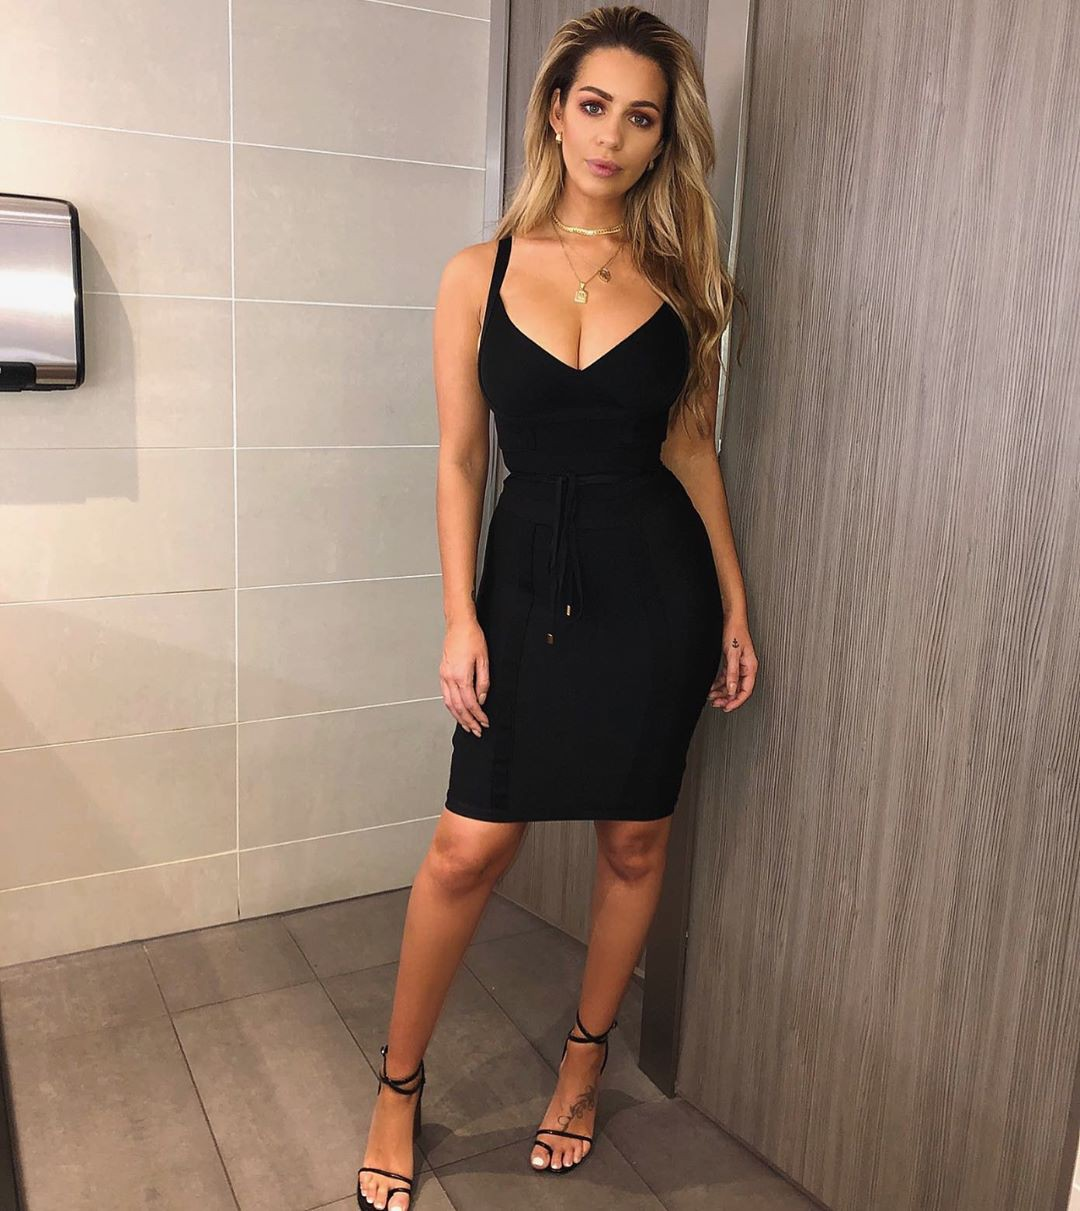 black dresses ideas with cocktail dress, legs photo